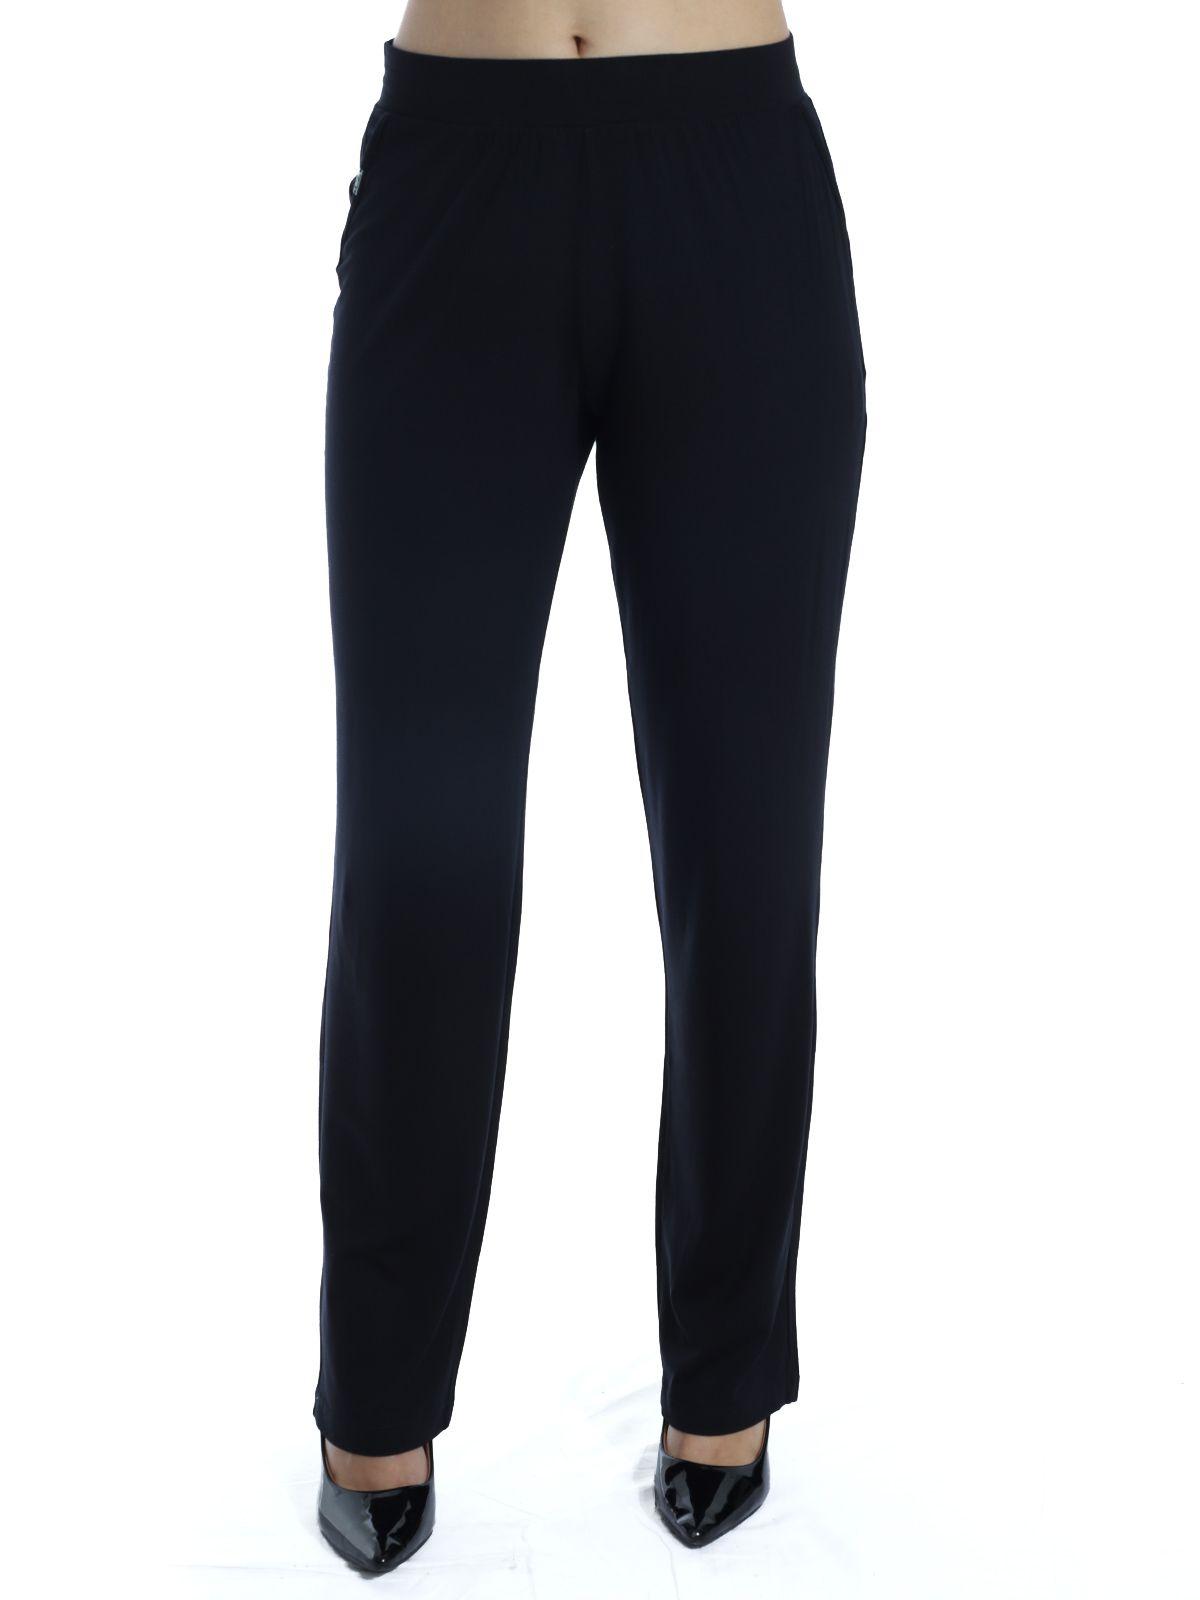 Calça Pantalona Viscolycra Anistia Lisa Preta